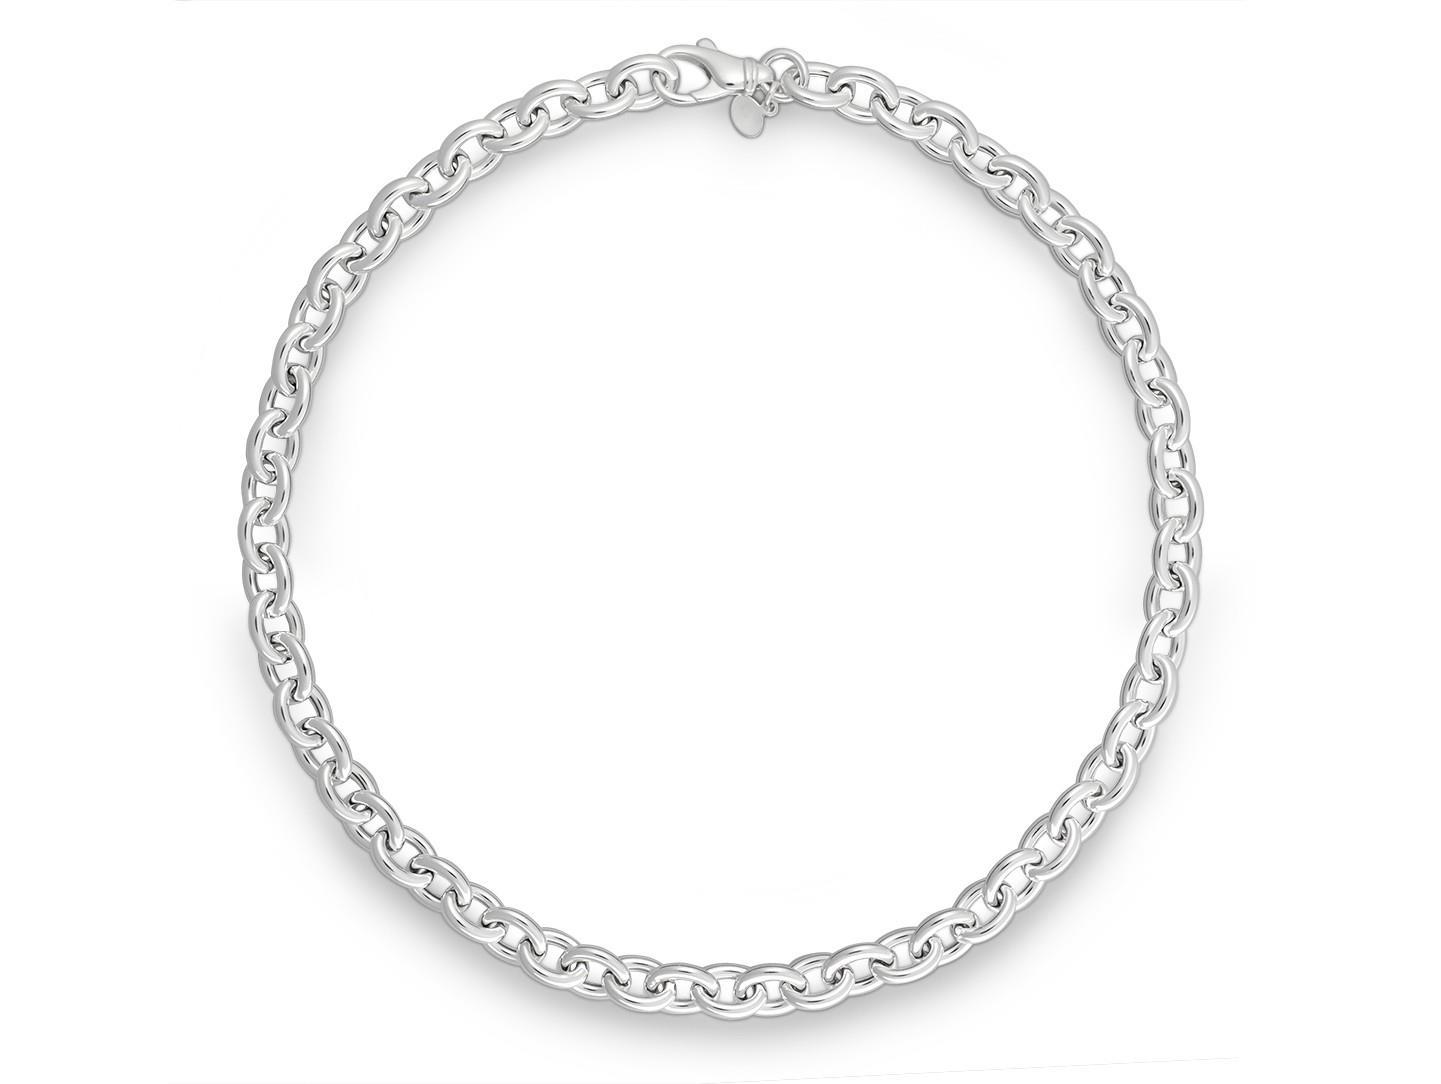 Collier 925 925 Silber